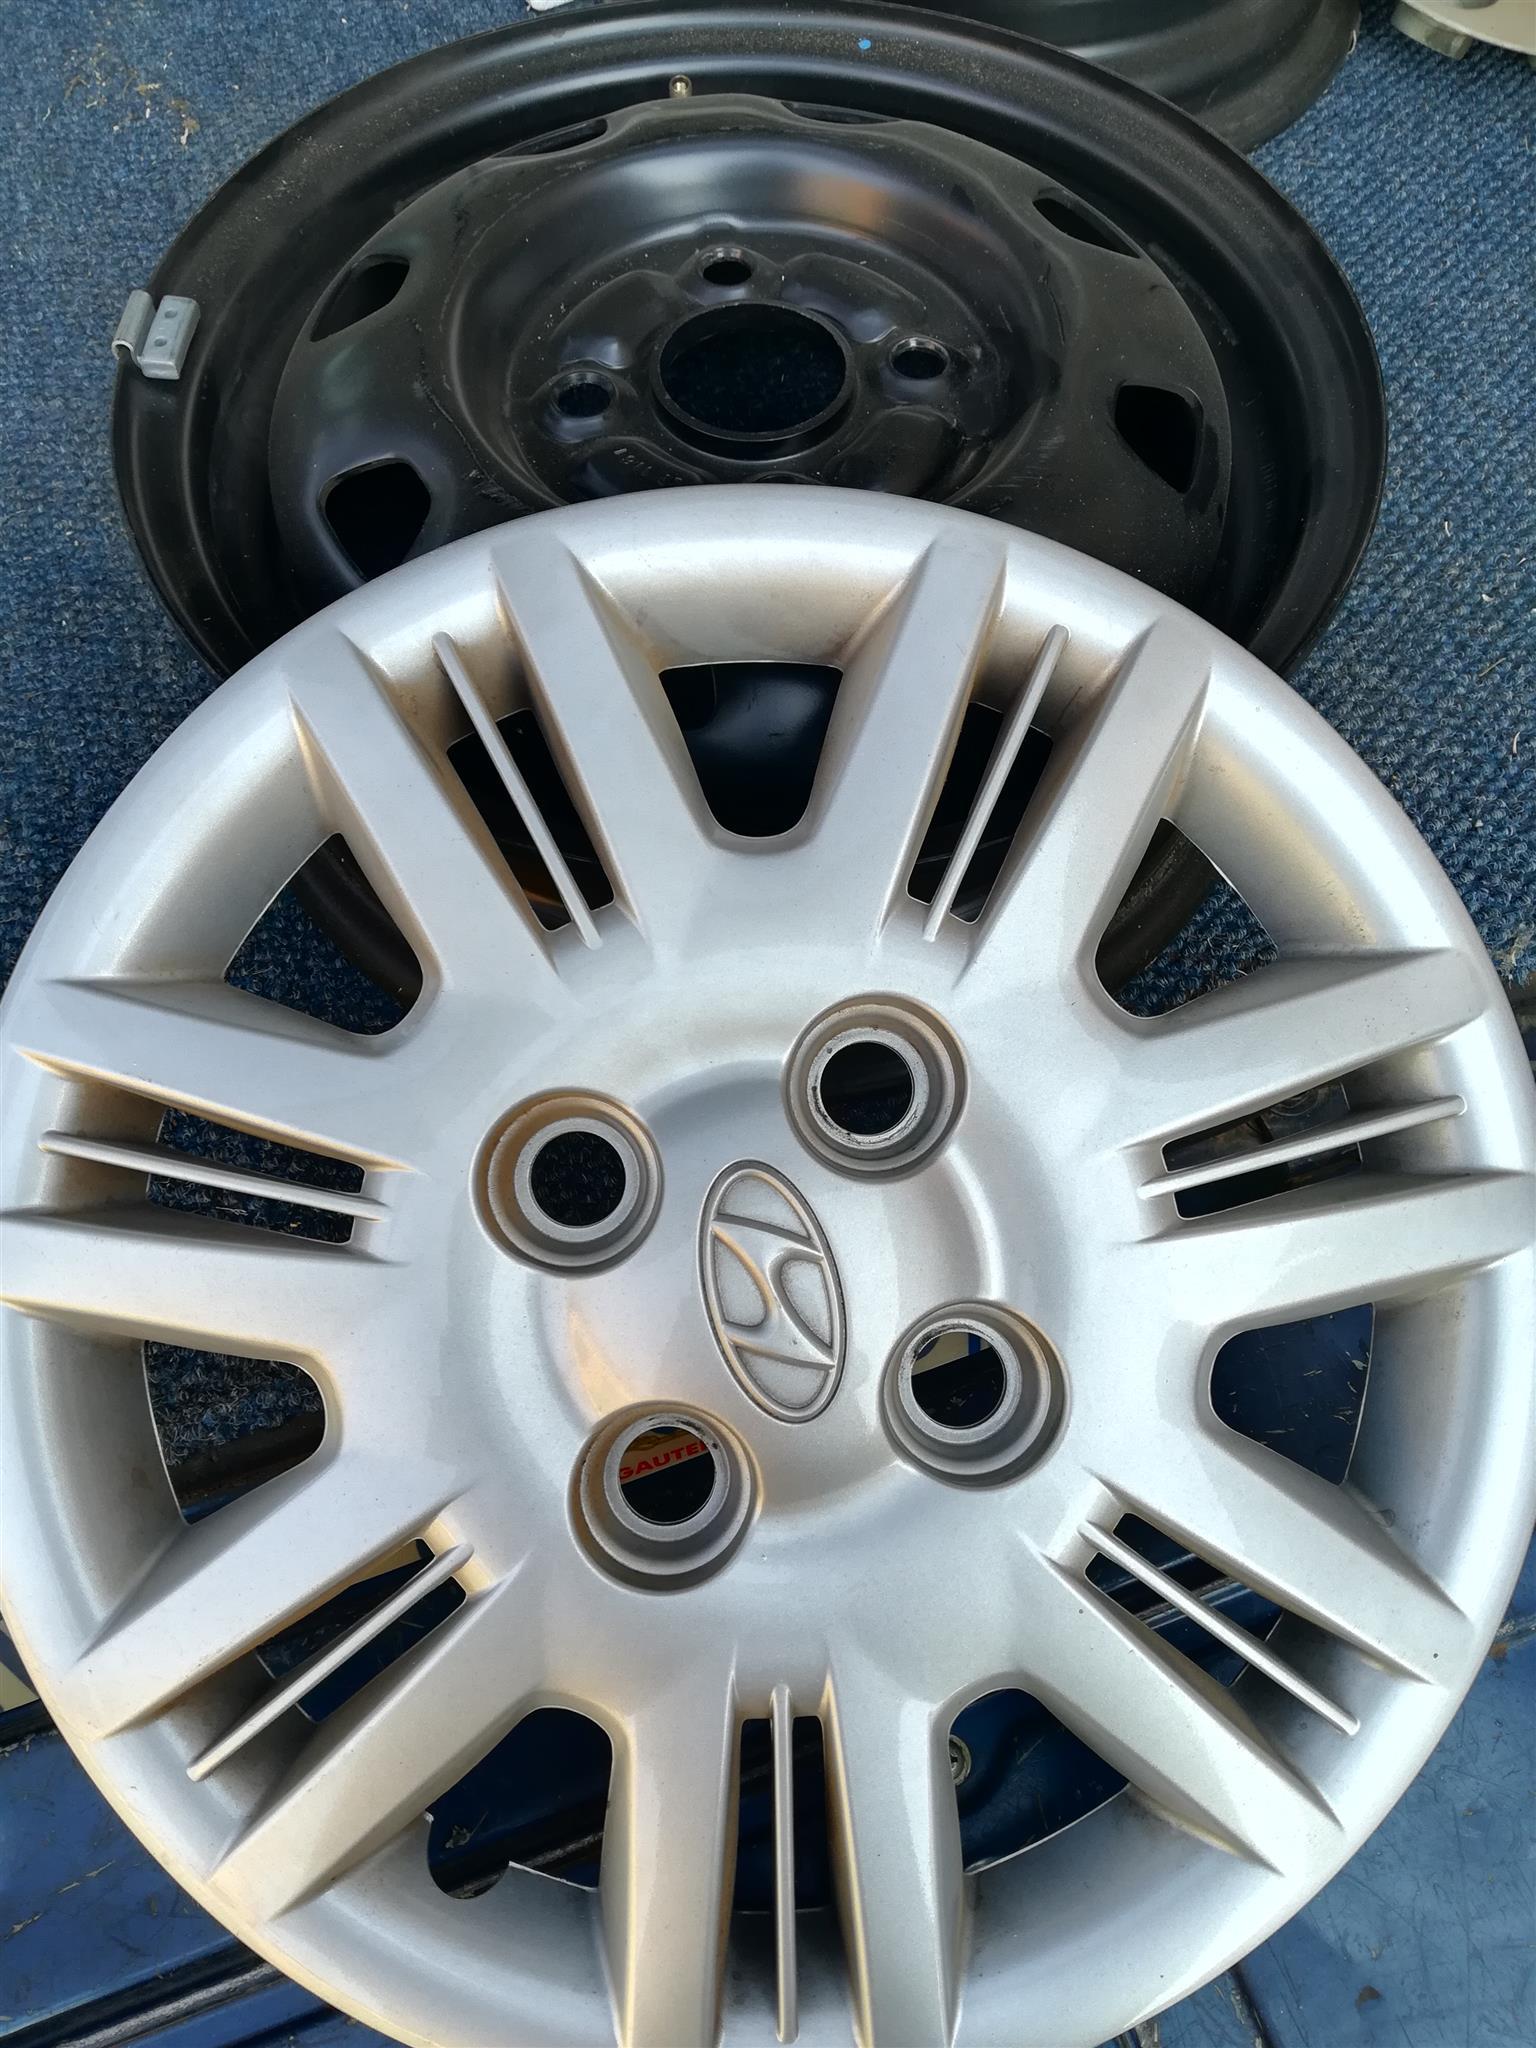 Atos Prime standard rims and wheelcaps